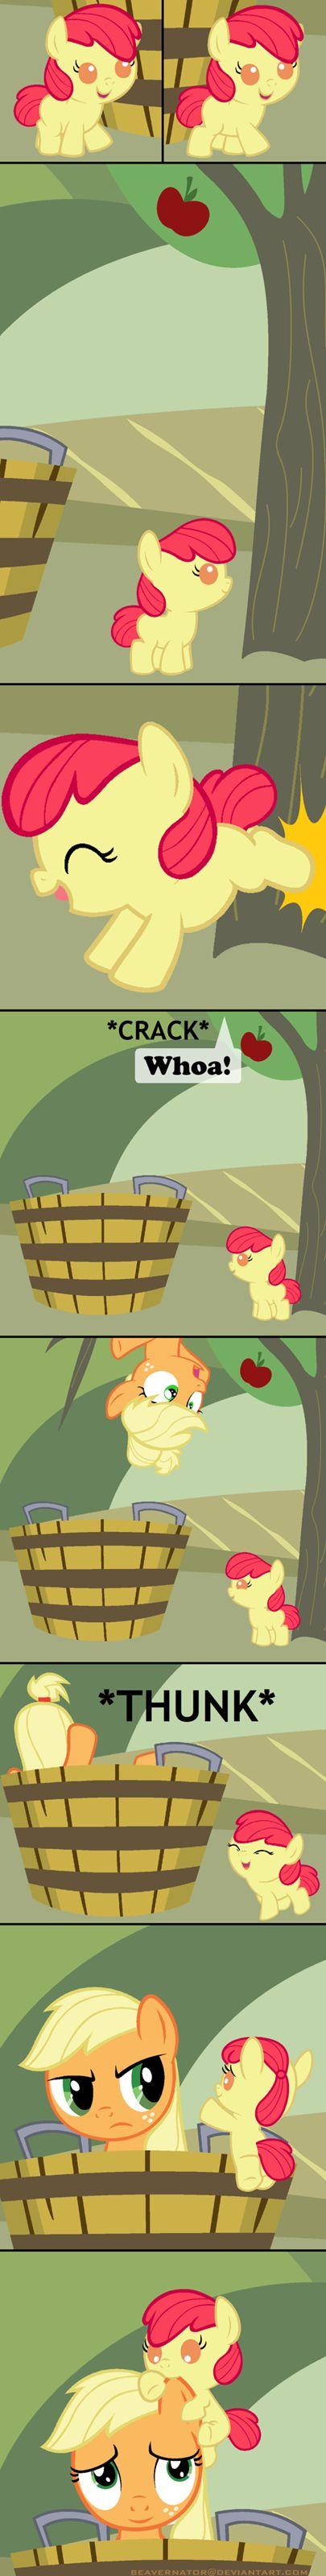 D'awwMlp Fim, Applejack Bucks, Apples Bloom, Bucks Seasons, Ponies, Bloom Bucks, Trees, Daww, Mlp Stuff